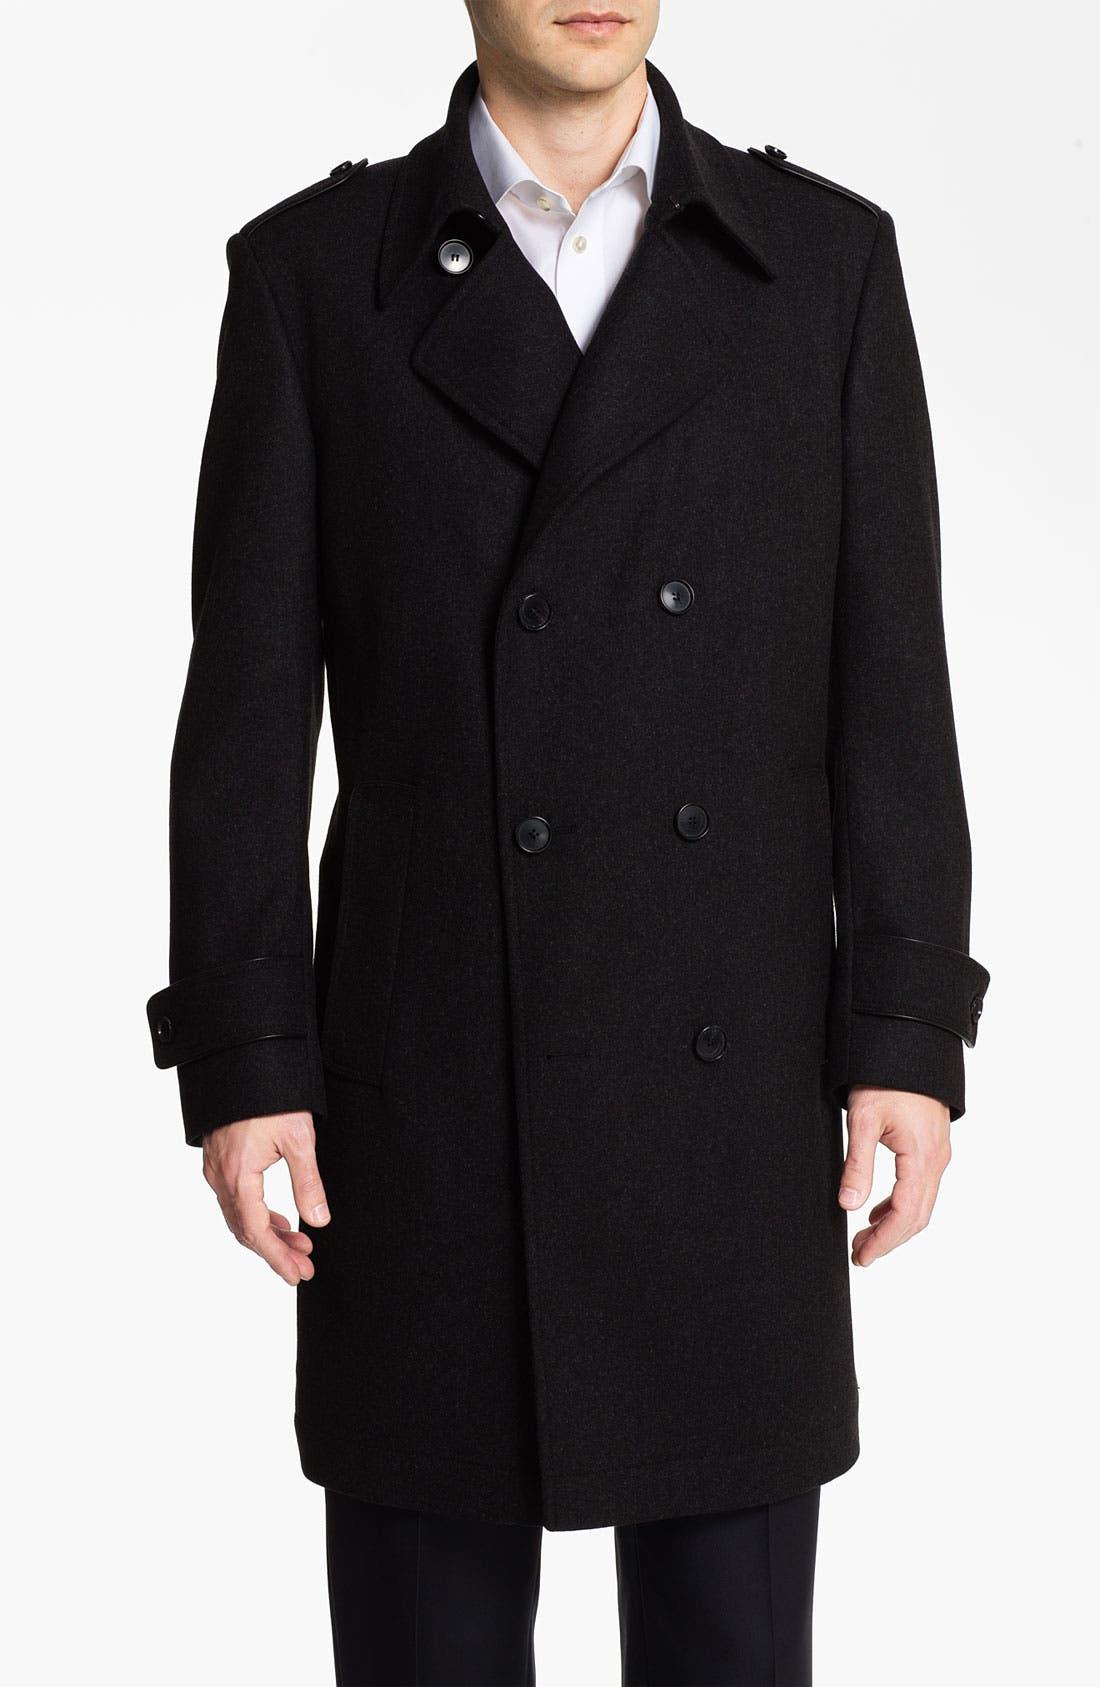 Main Image - BOSS Black 'Husk' Double Breasted Topcoat